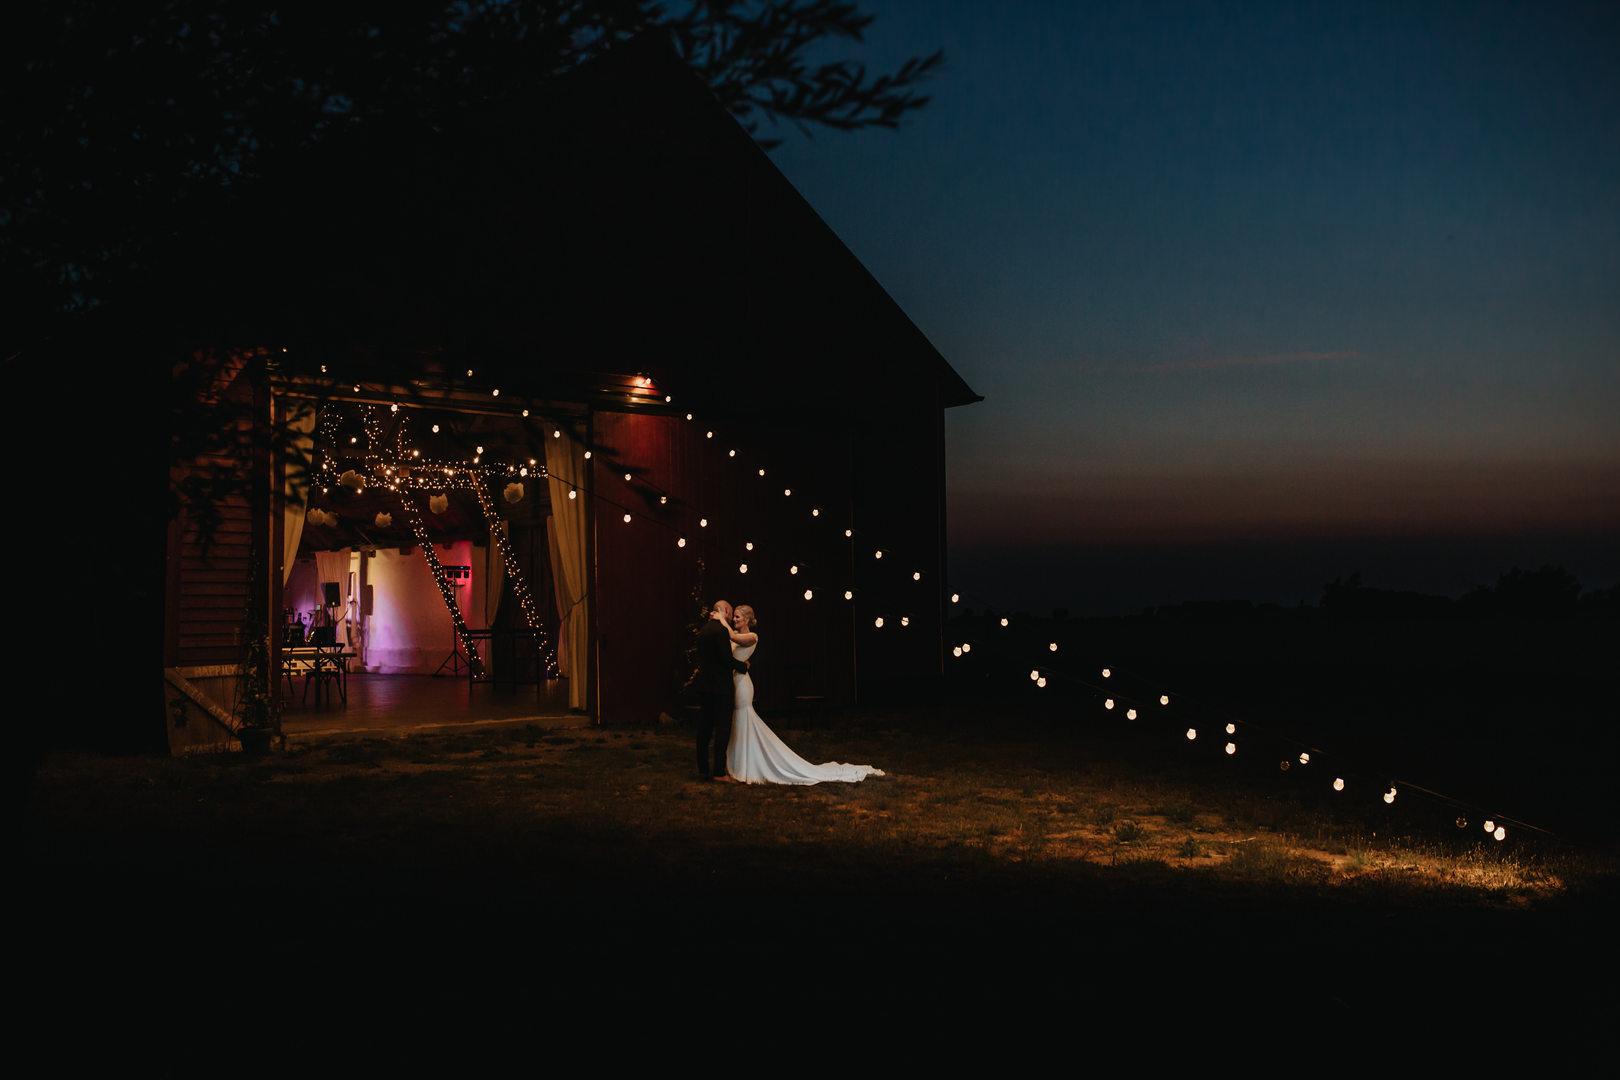 2018#wedding#mathilda andersson# (1).jpg